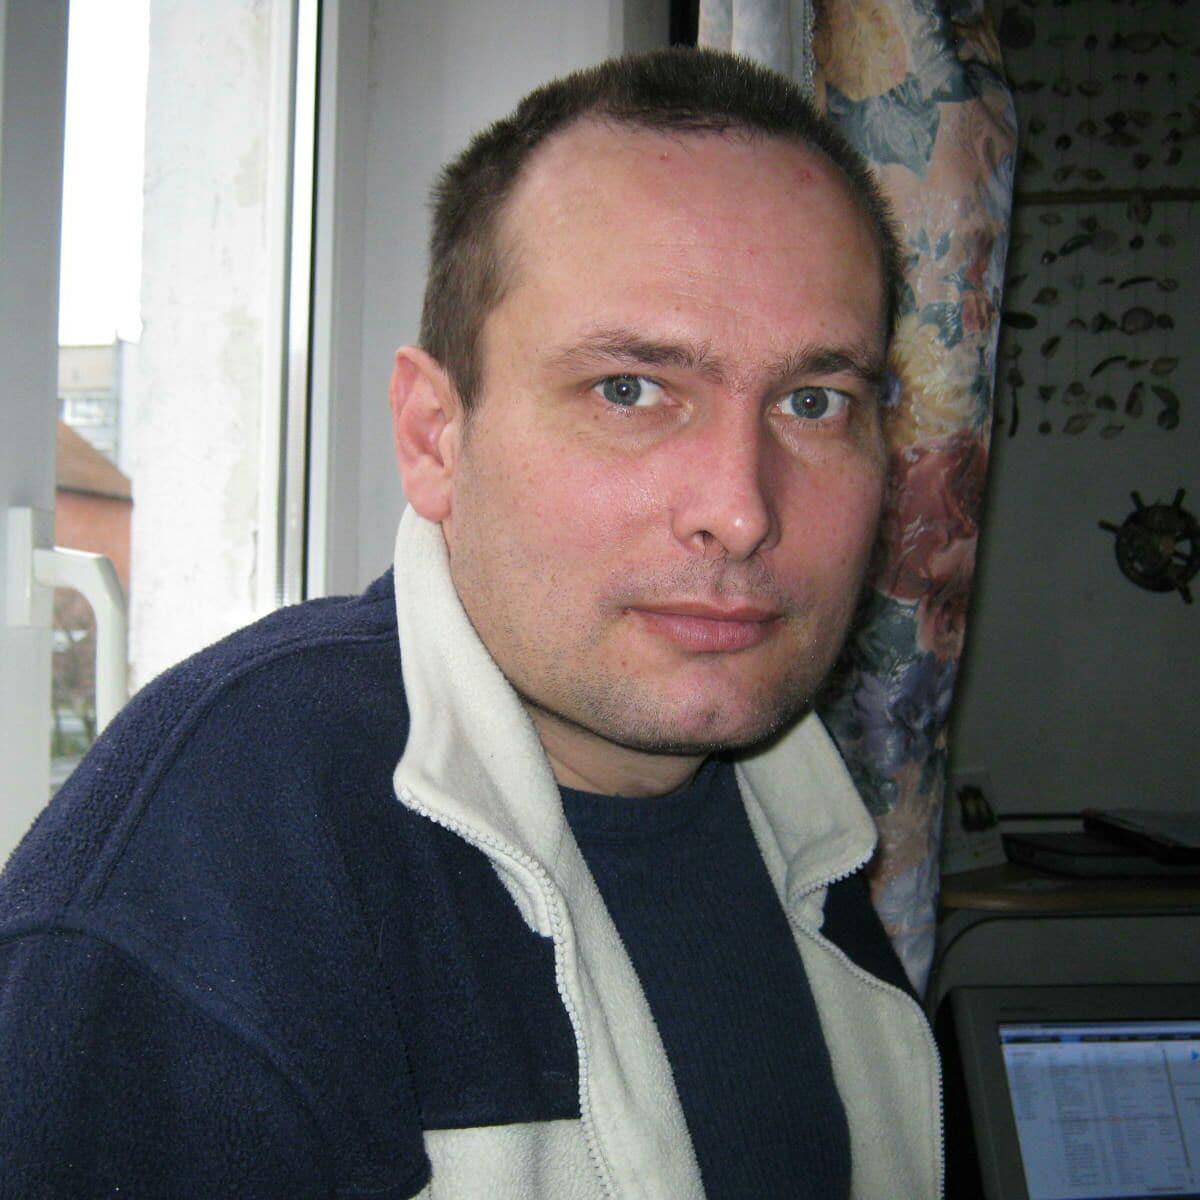 Николай from Kaliningrad